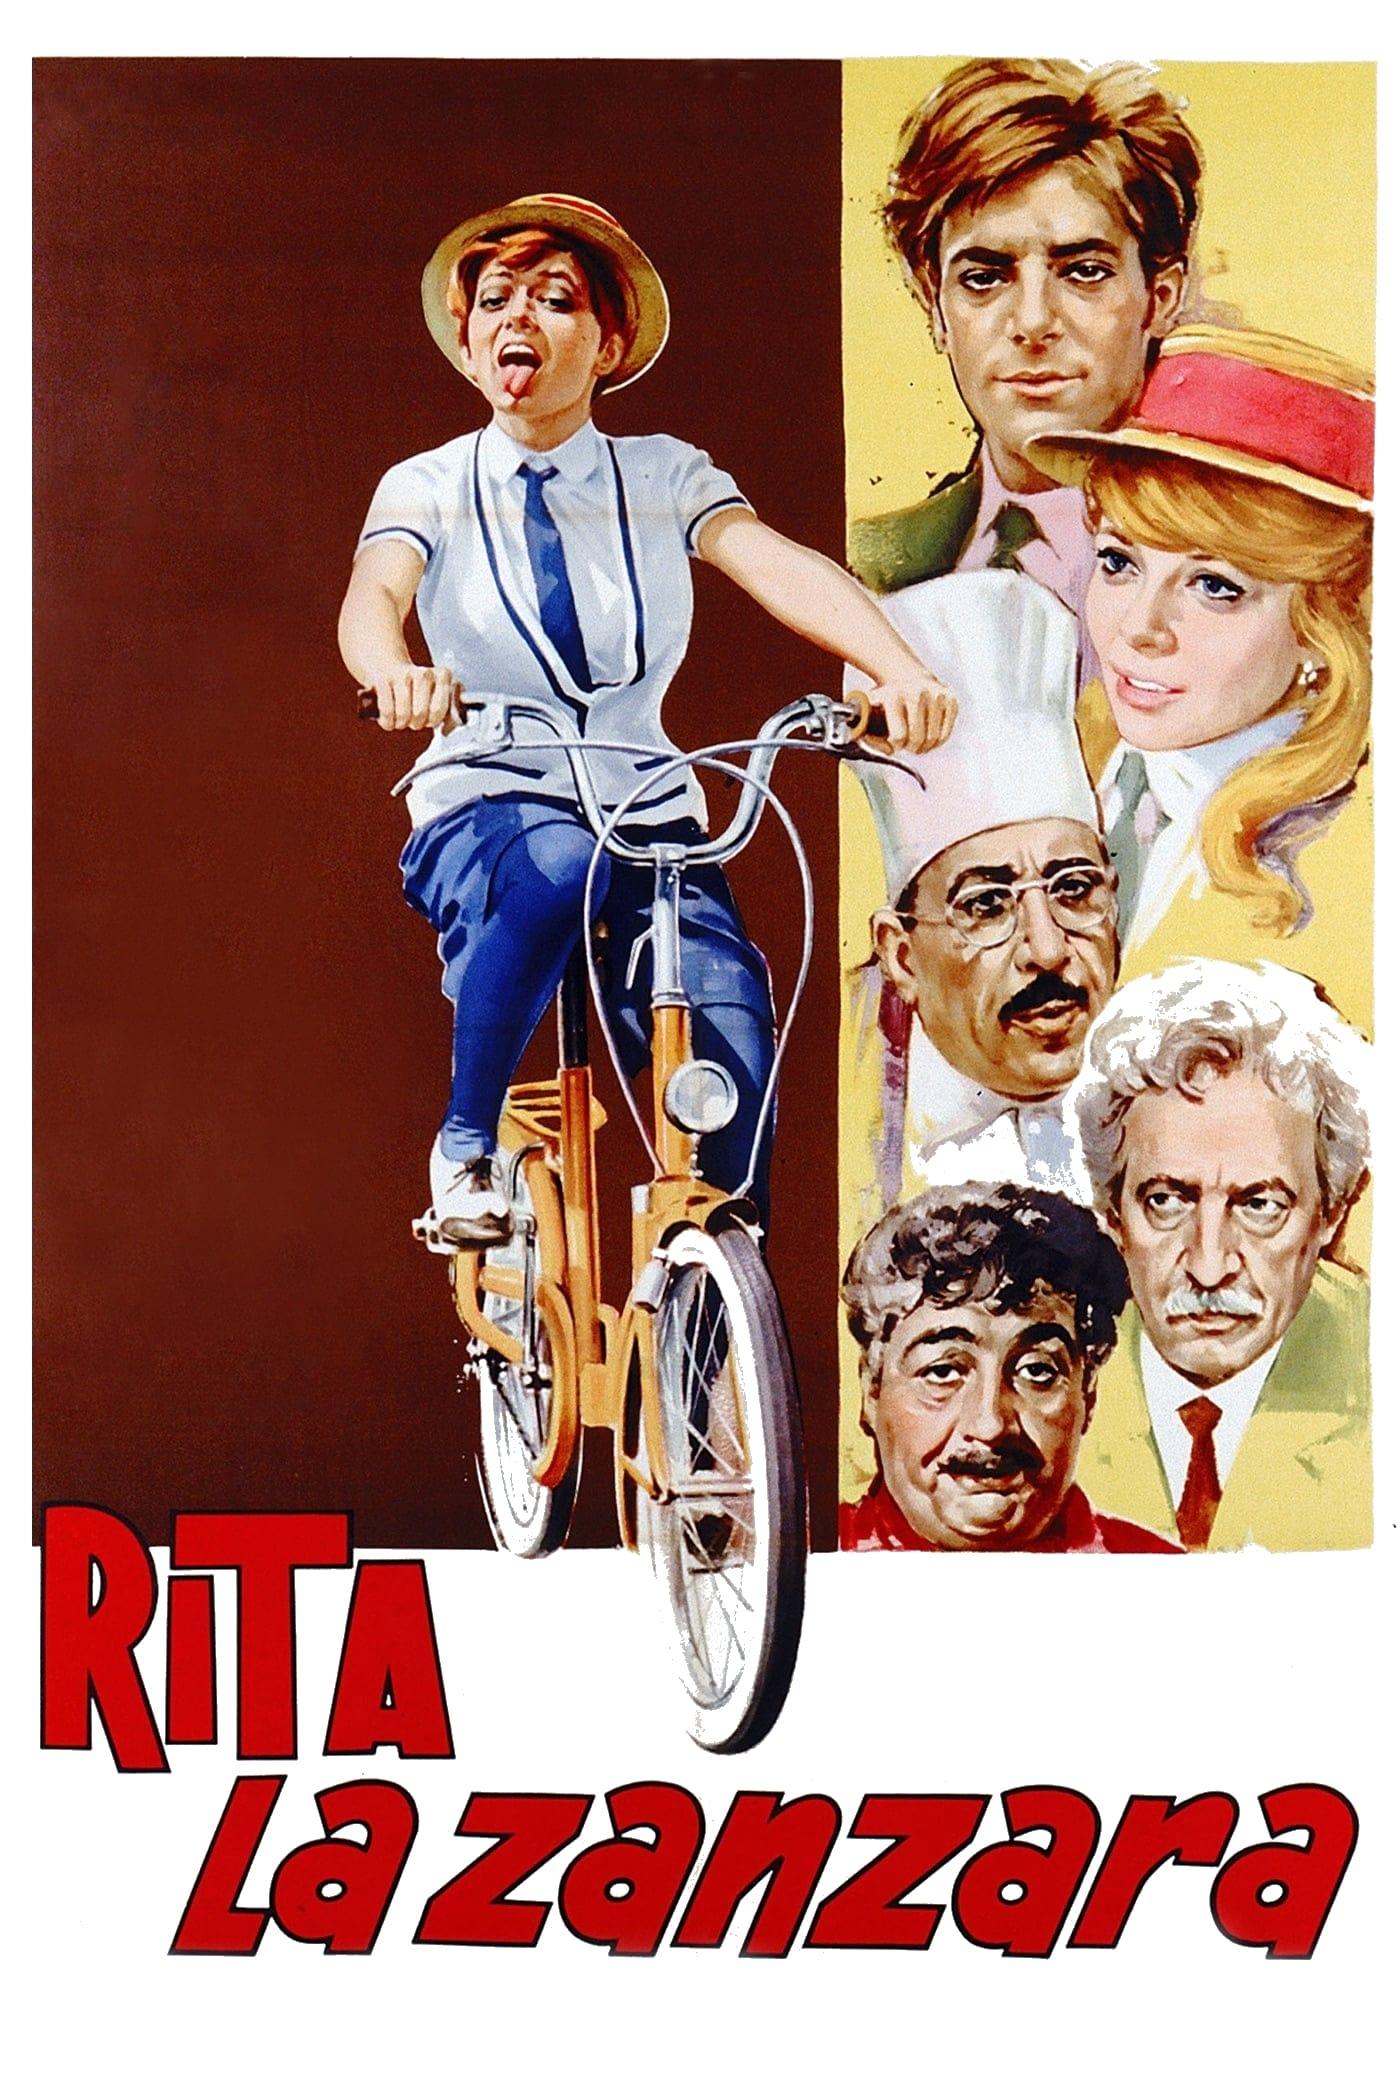 Rita the Mosquito